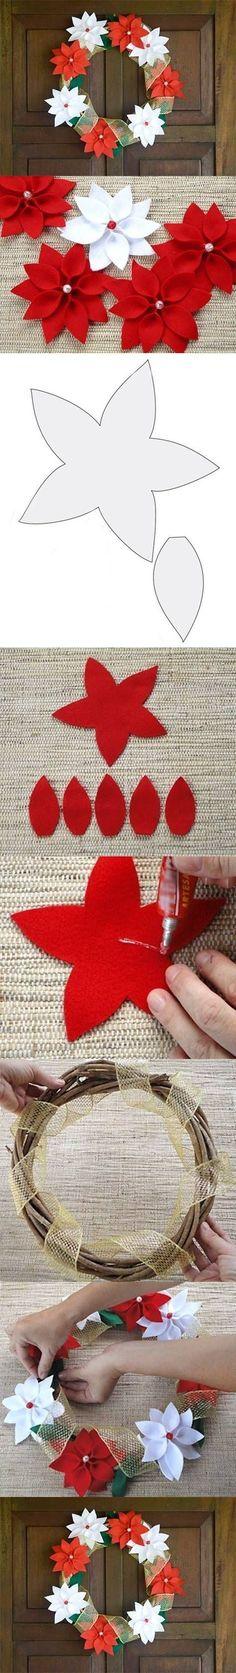 DIY Felt Christmas Wreath DIY Projects / UsefulDIY.com